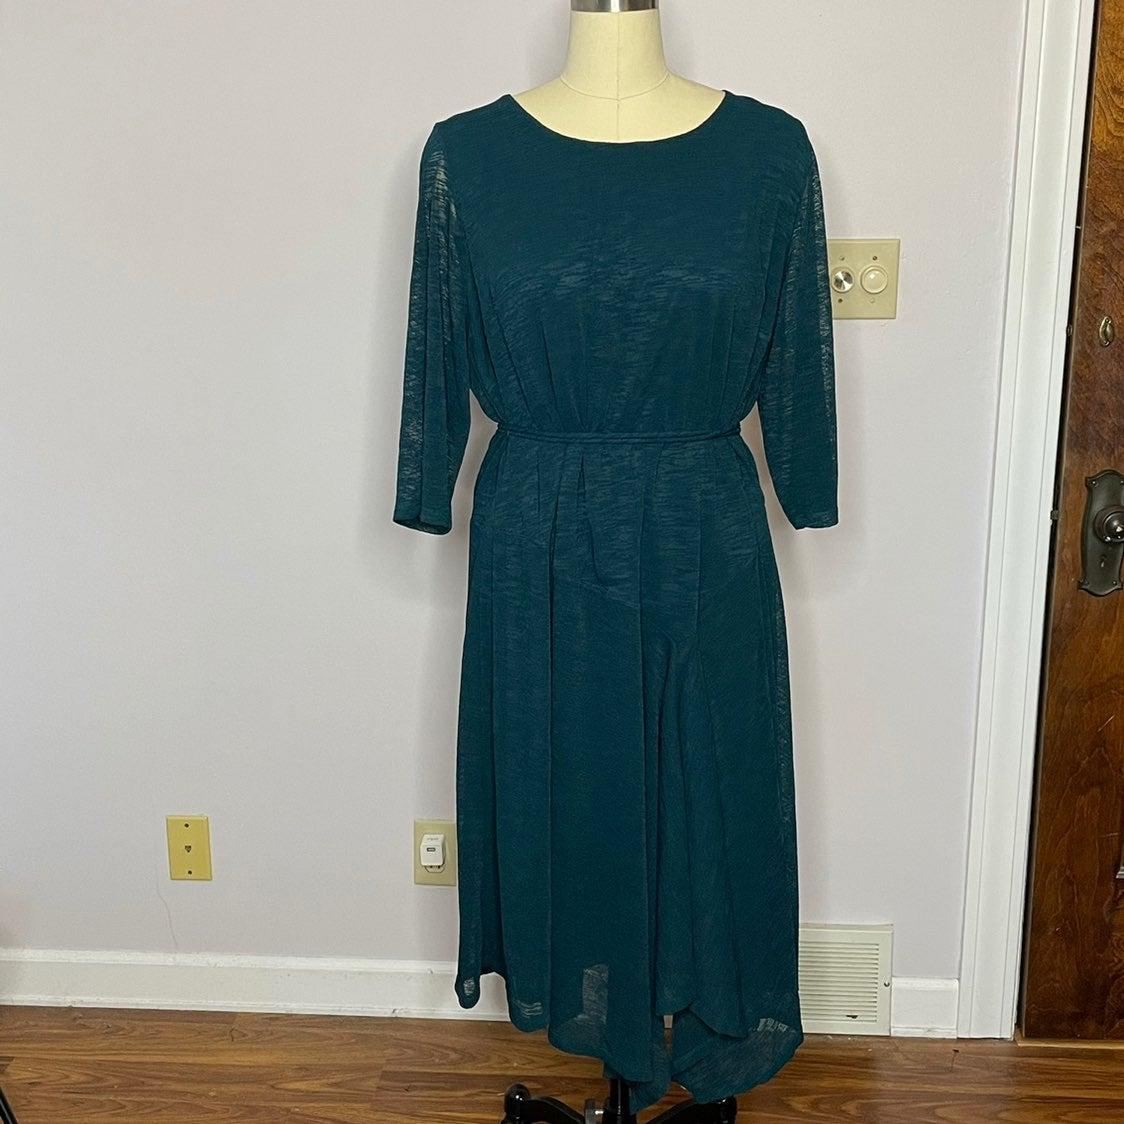 Catherine's Dark Teal Belted Dress